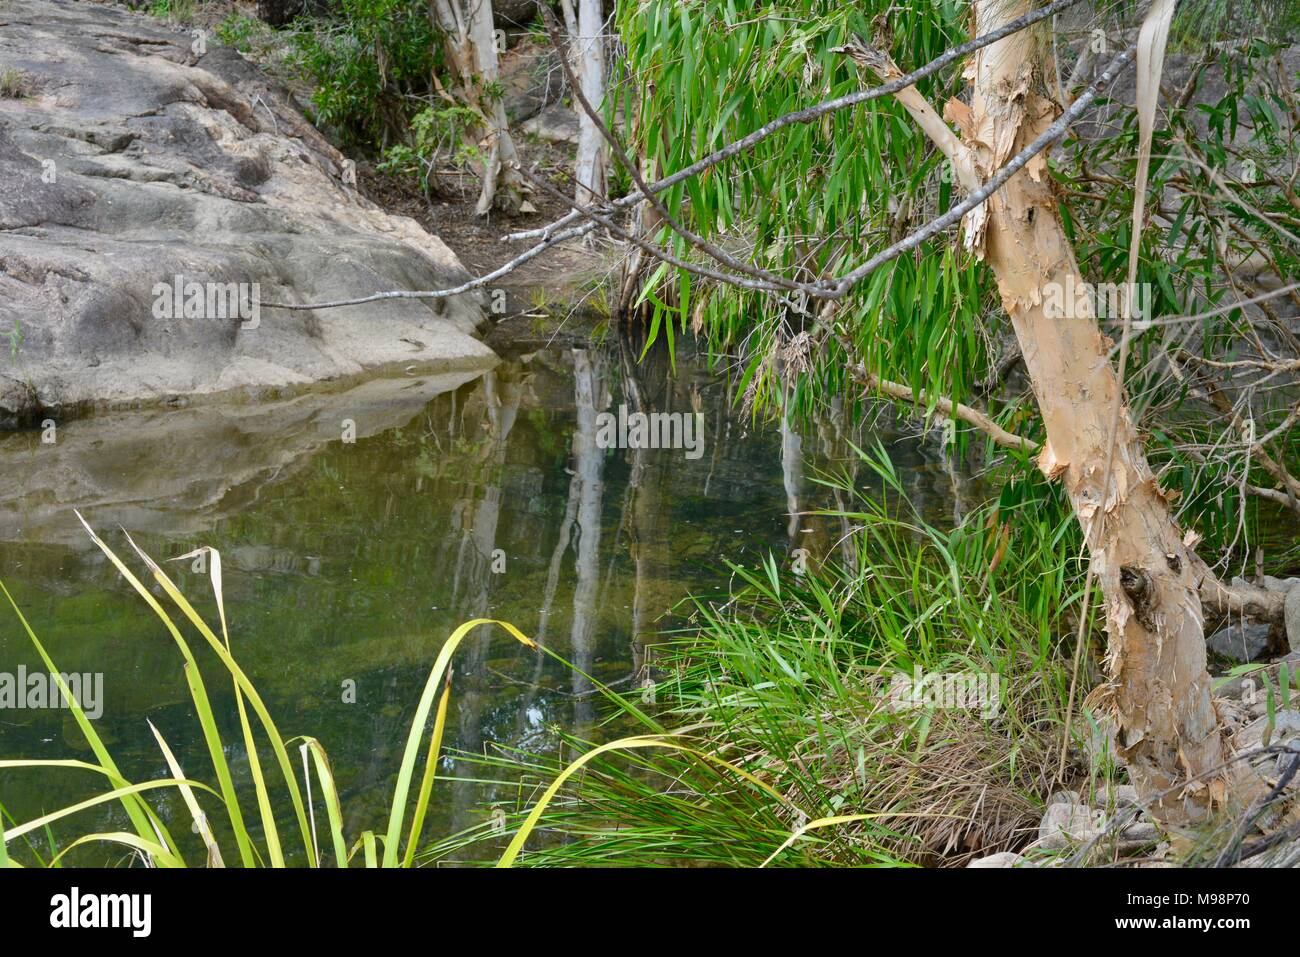 Crystal Creek QLD 4816, Paluma range national park, Australia - Stock Image